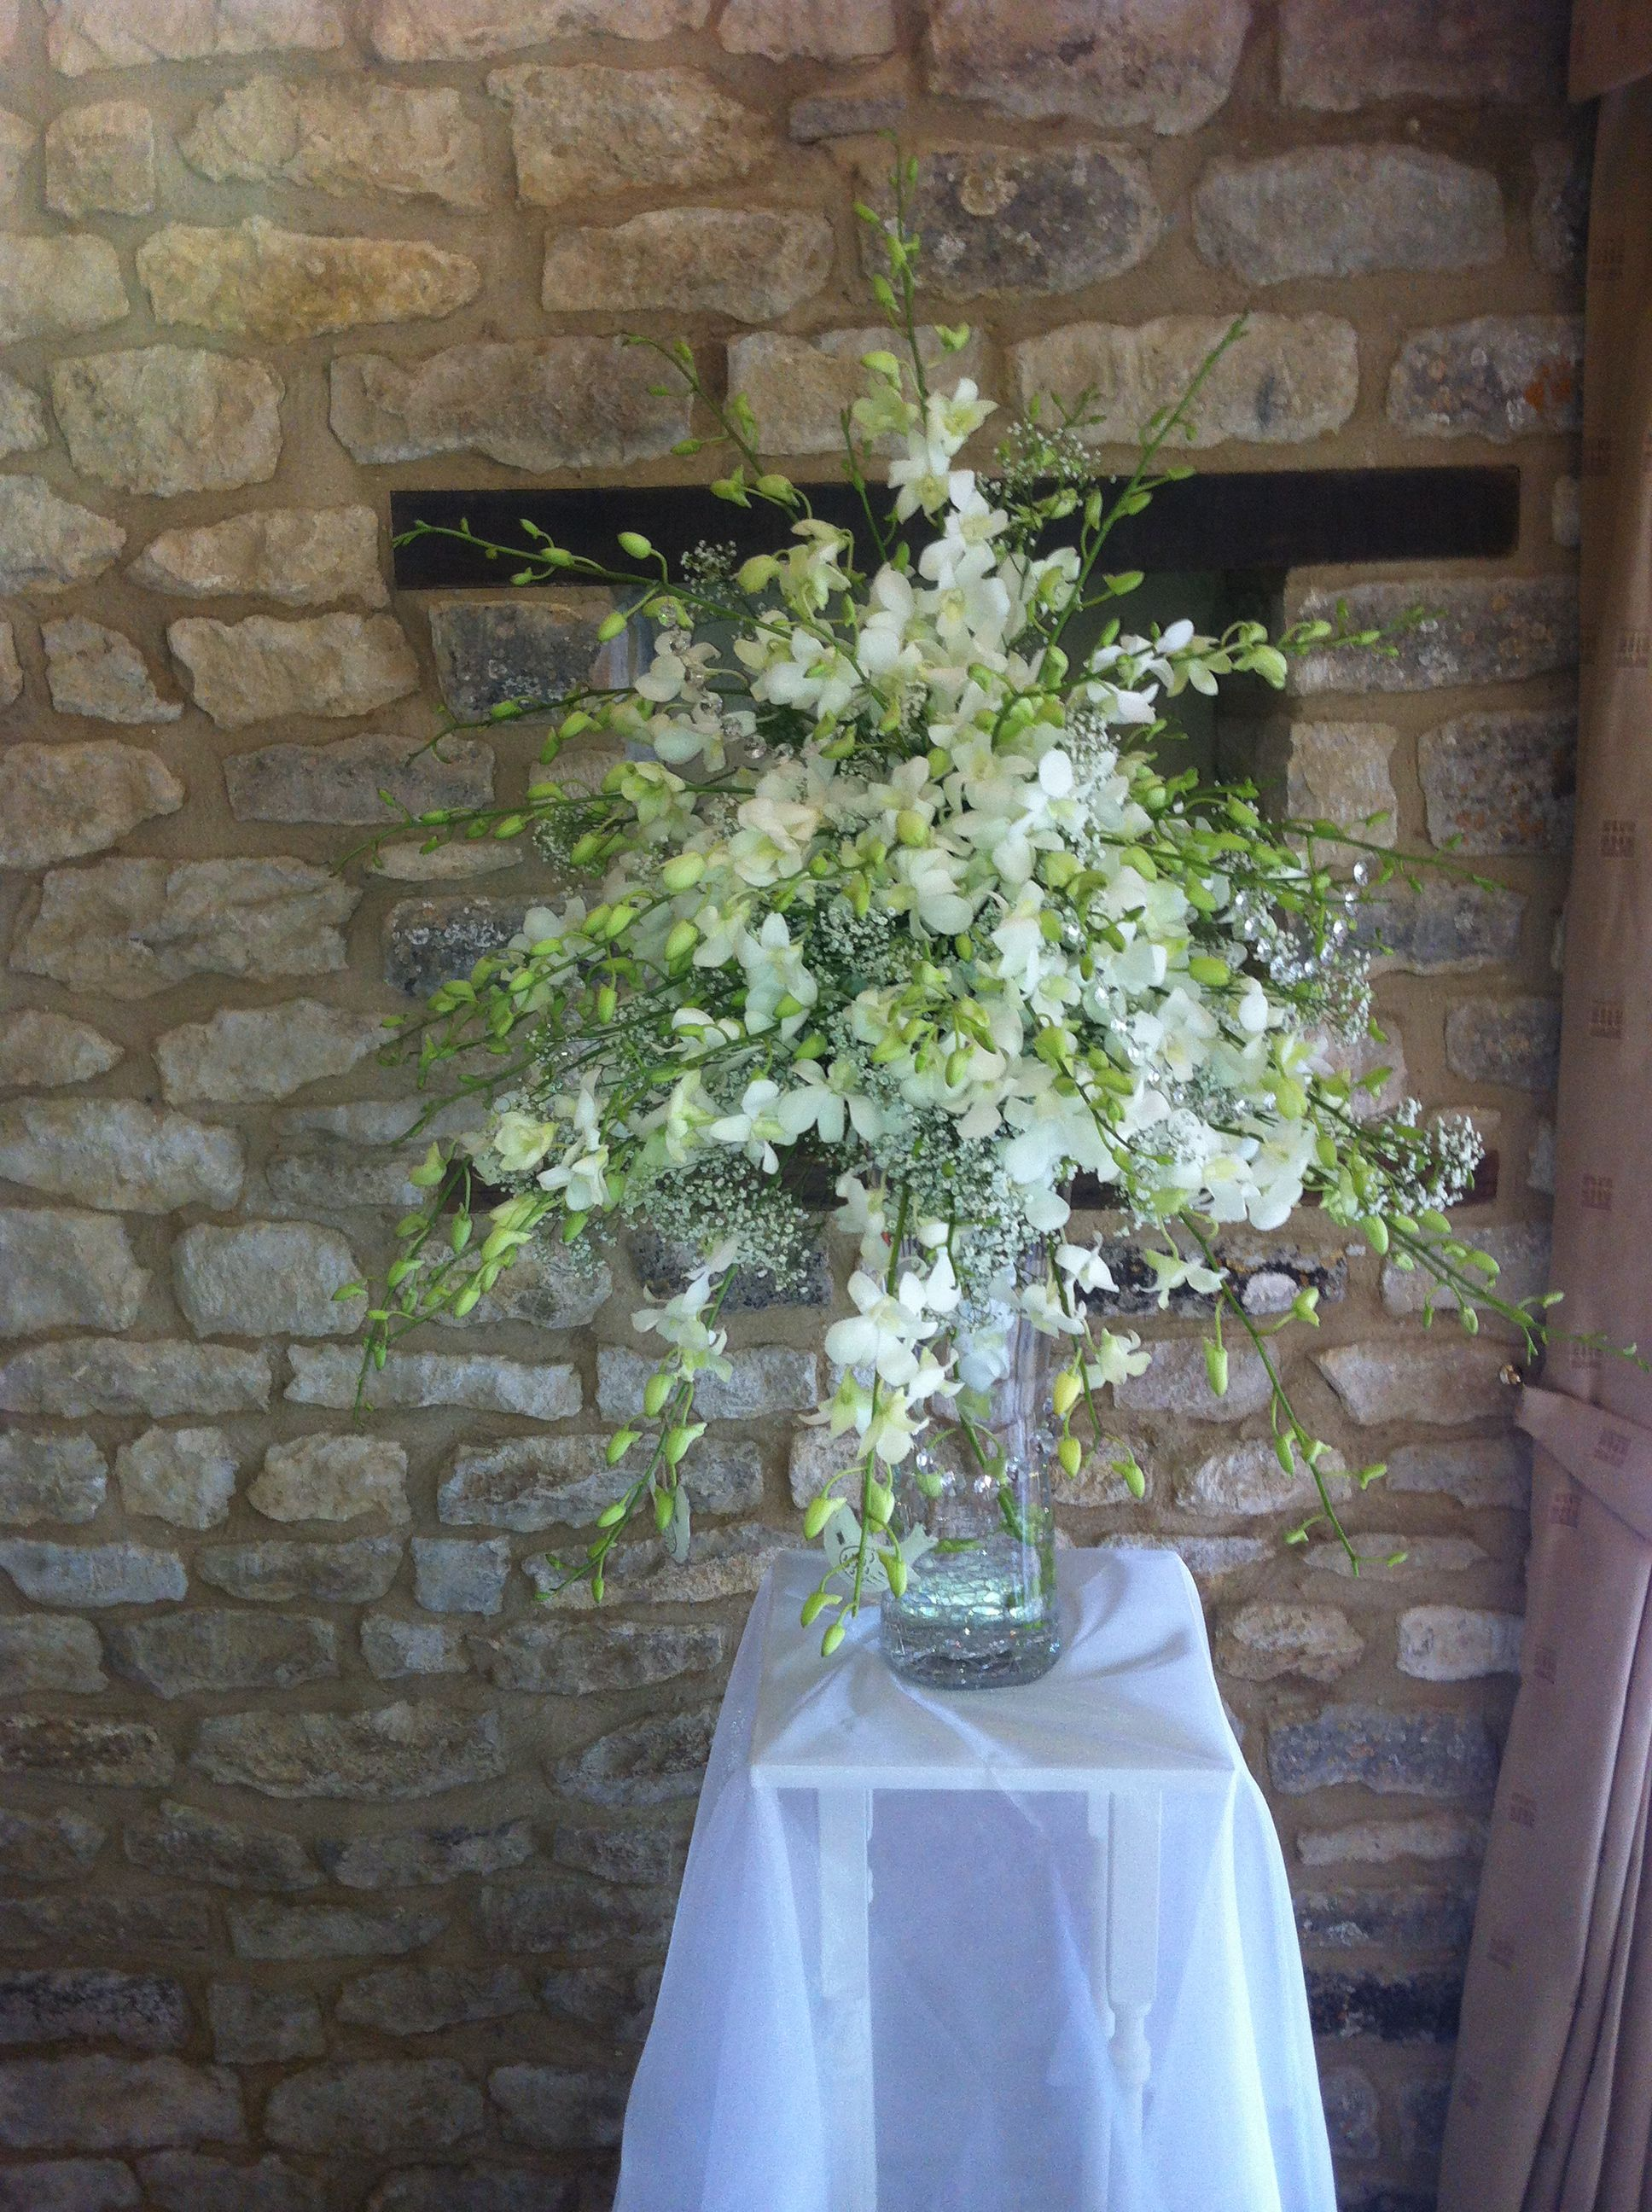 wedding venue pedestal stands for ceremony room, white